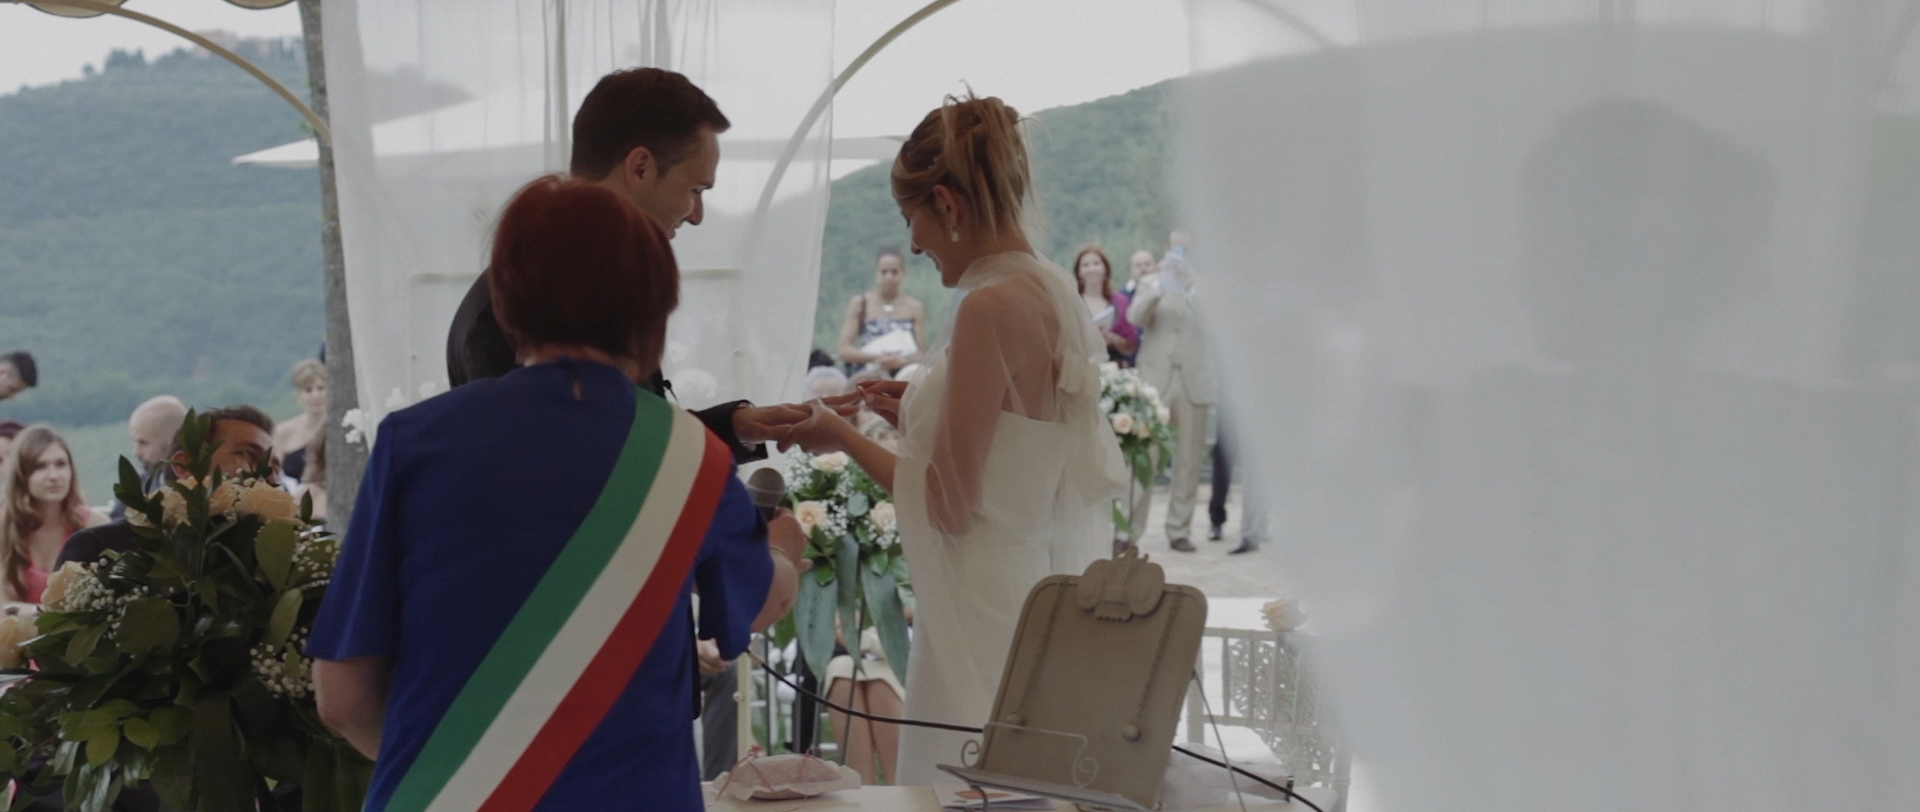 Frederic & Valentina | Trailer (Eng) 9